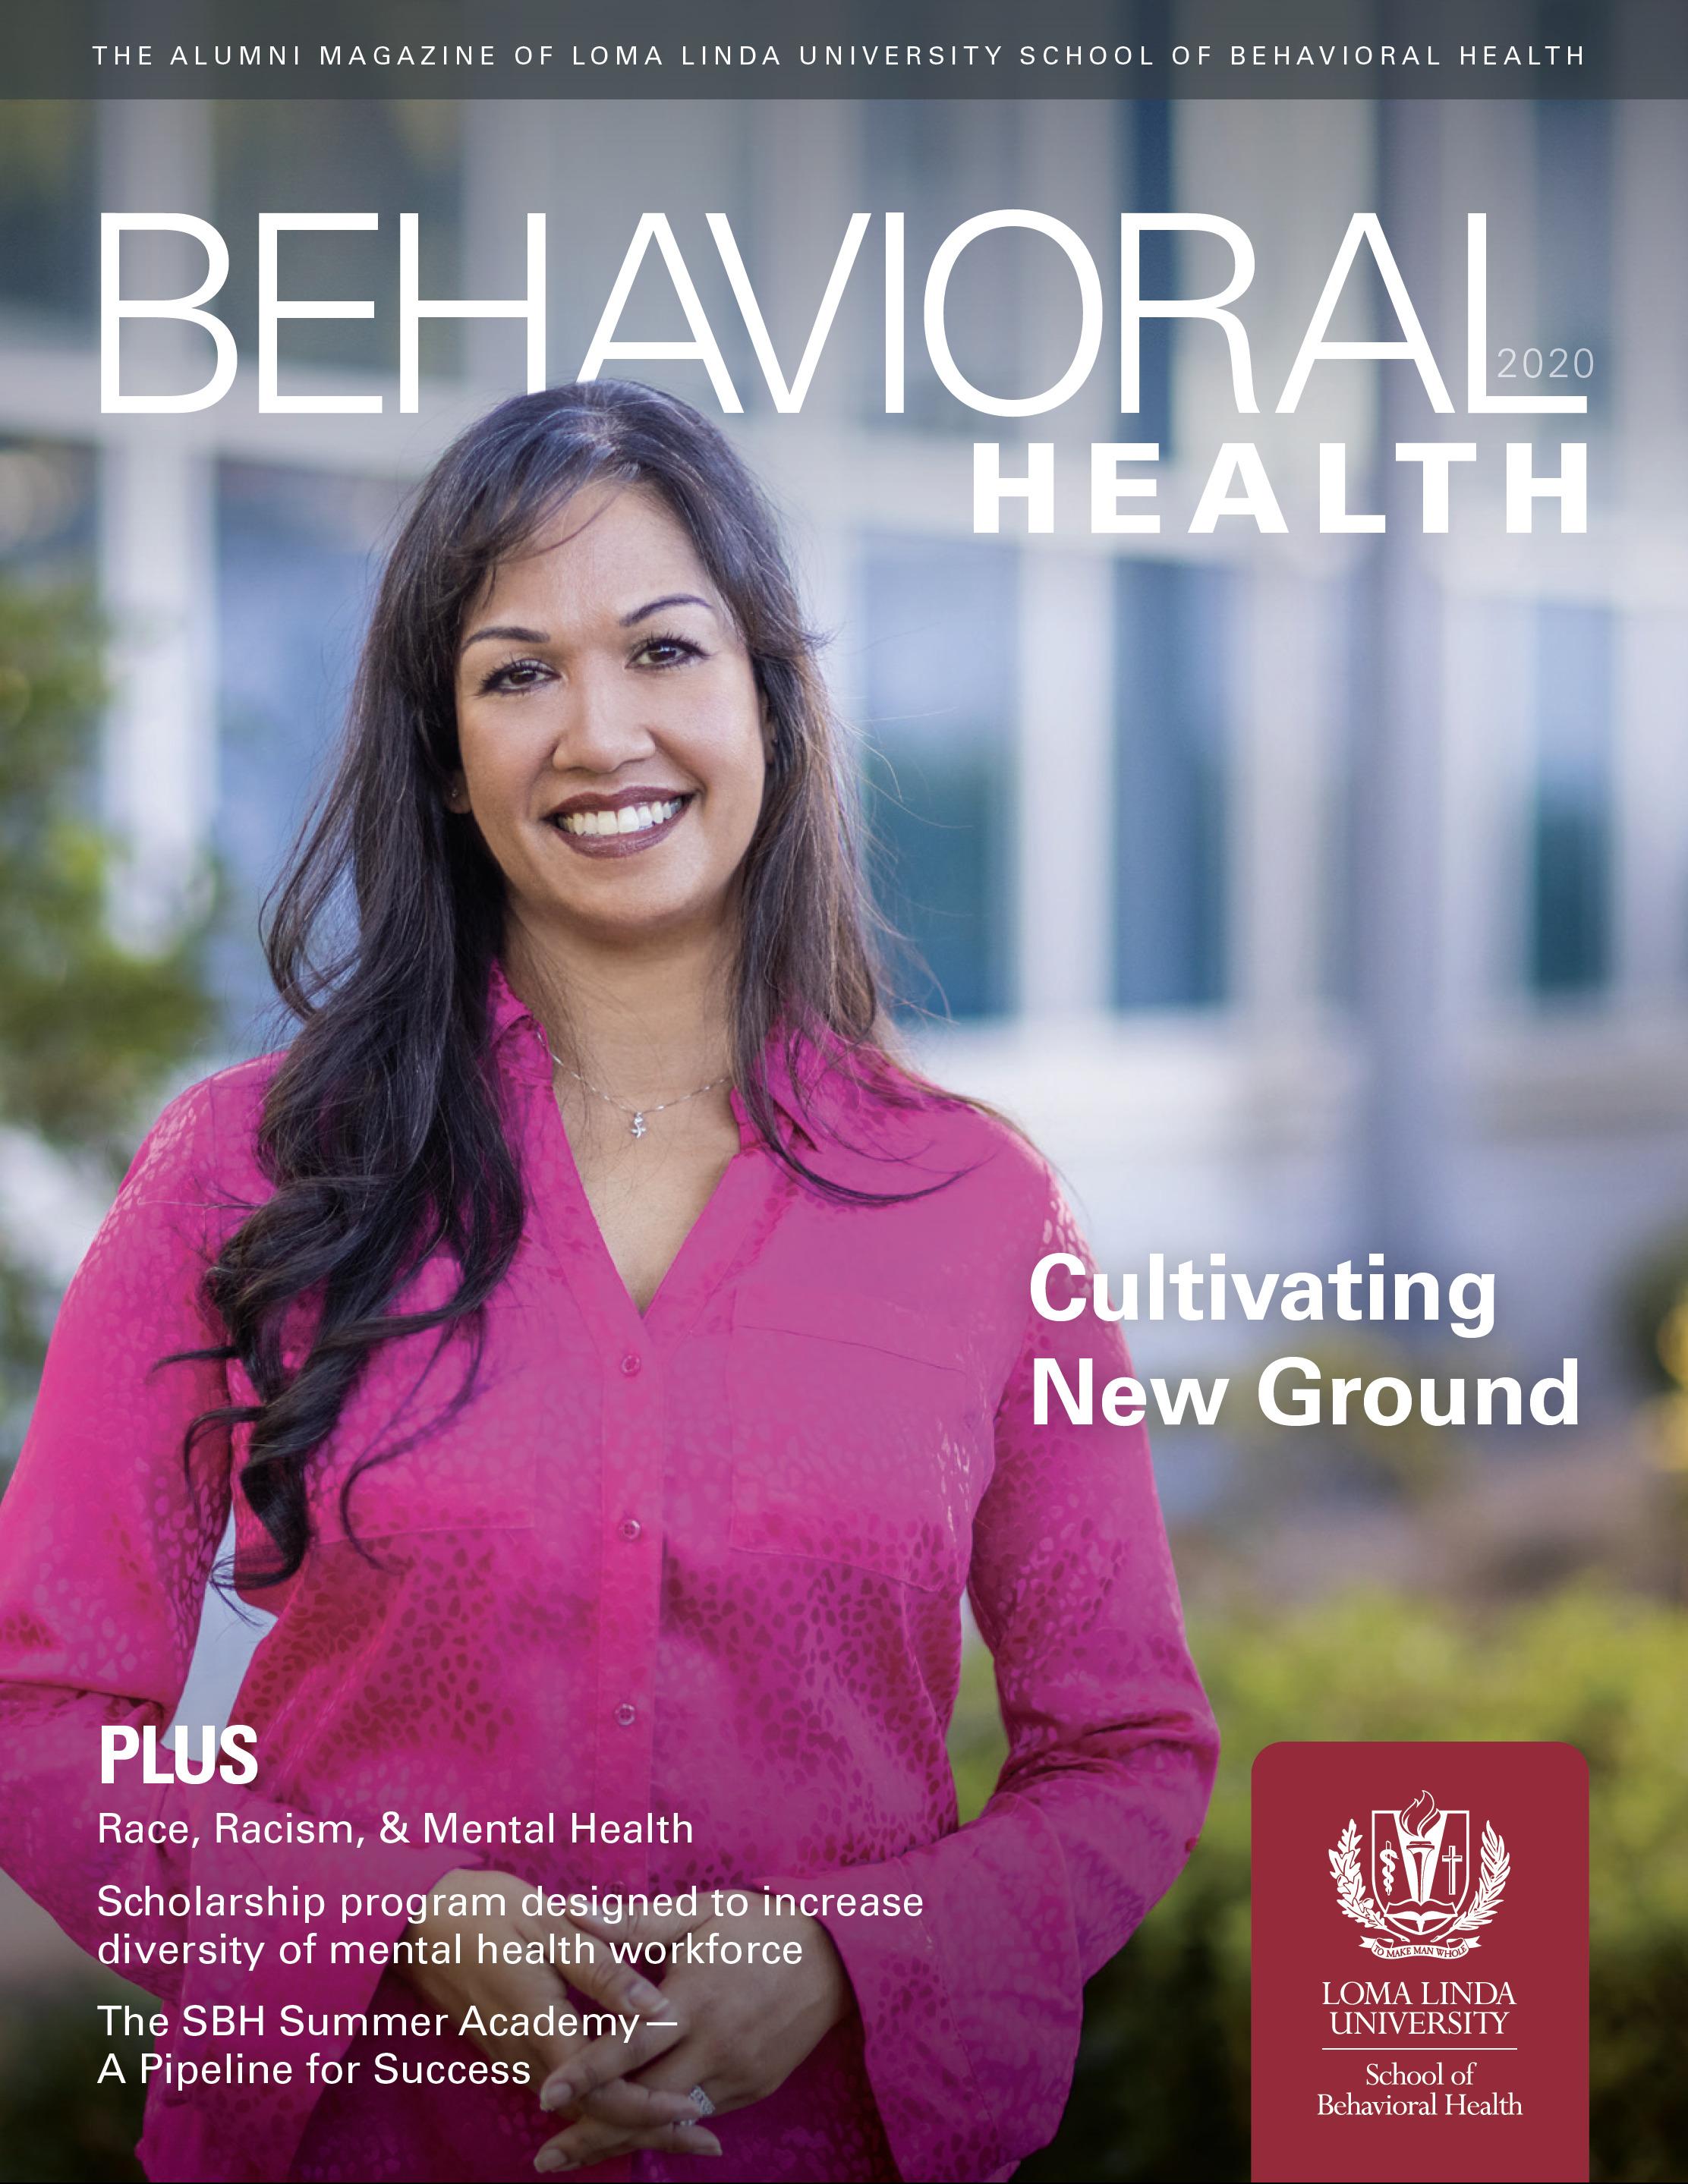 LLU Behavioral Health 2020